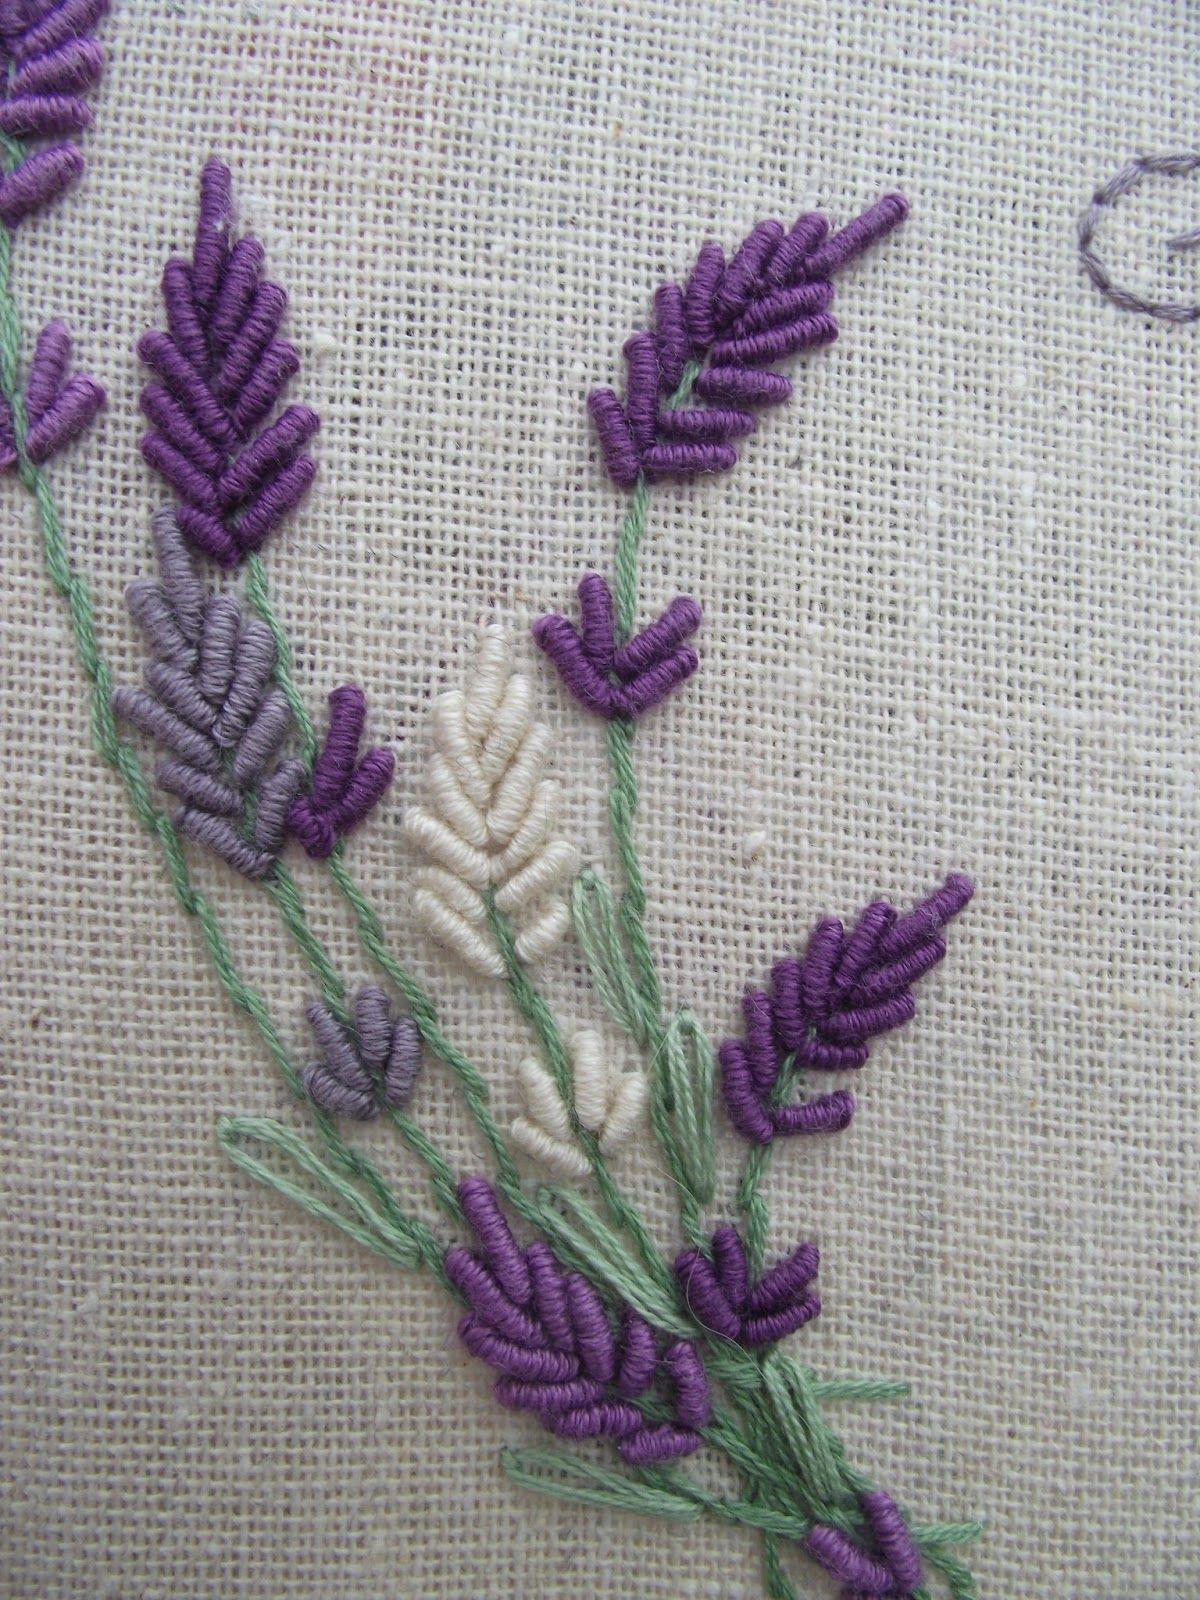 DSCF4497.JPG (1200×1600) | Stitchery | Pinterest | Lavender